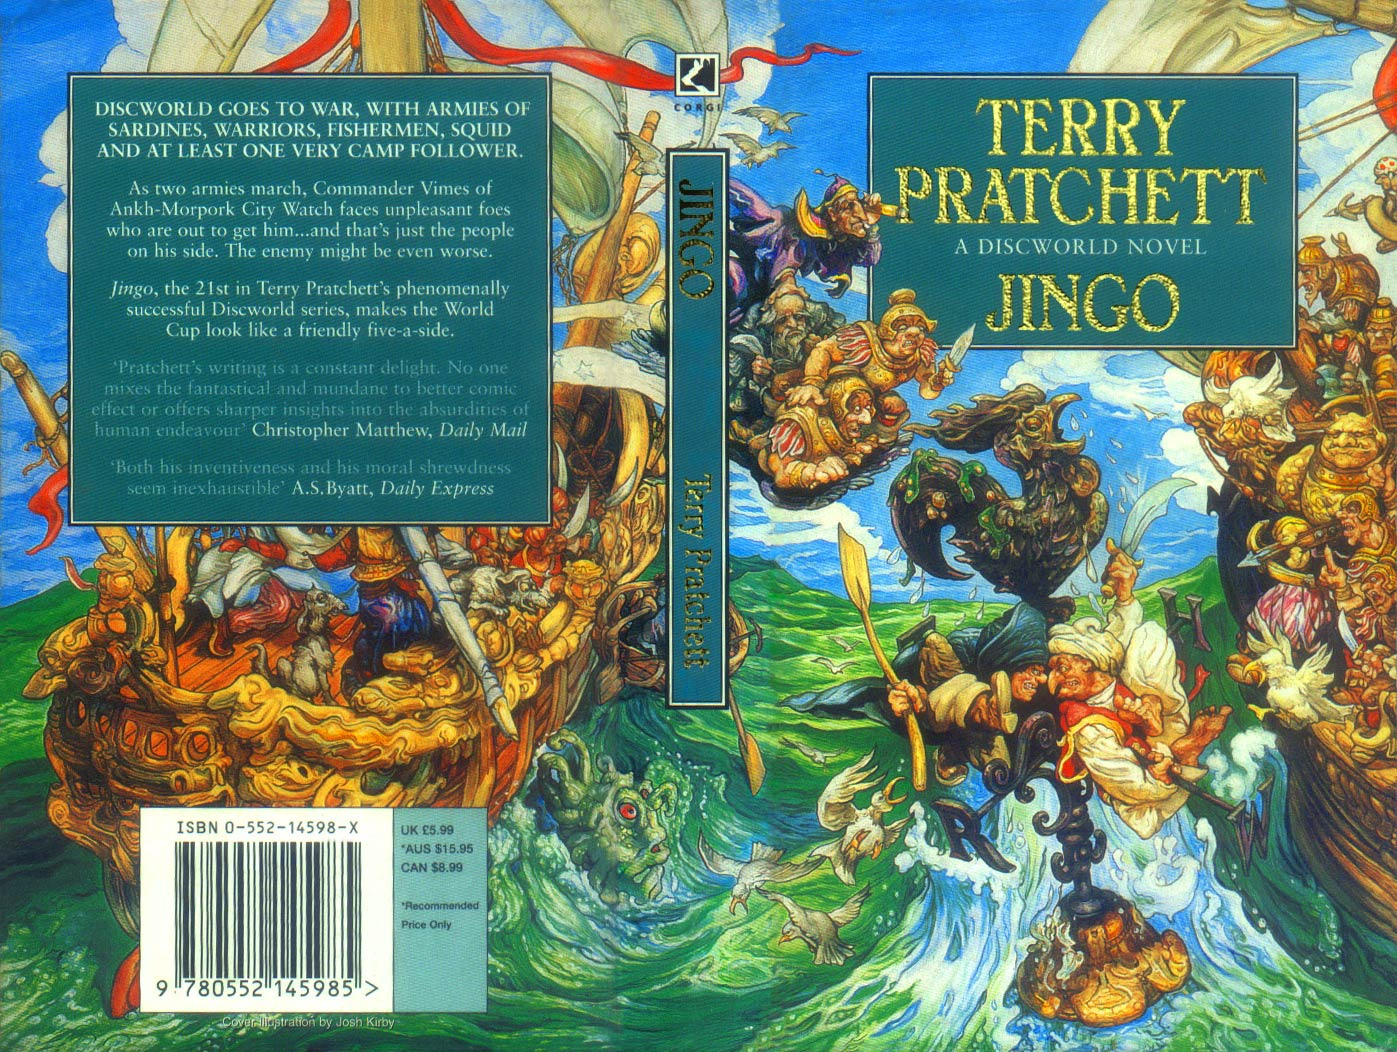 Jingo Book Covers